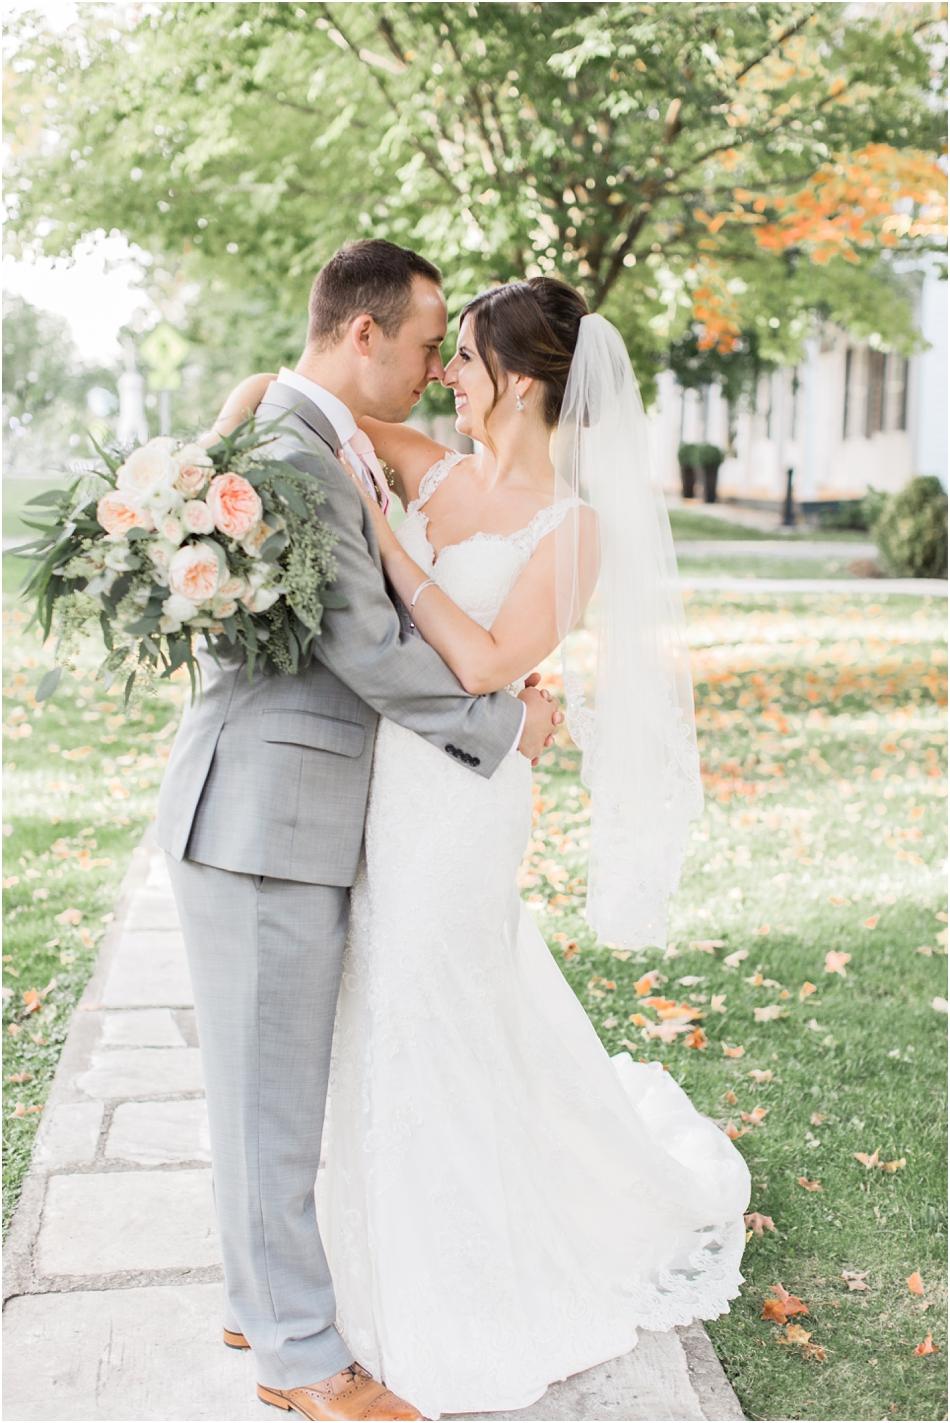 equinox_resort_golf_club_manchester_vermont_jennifer_matt_cape_cod_boston_new_england_wedding_photographer_Meredith_Jane_Photography_photo_2400.jpg